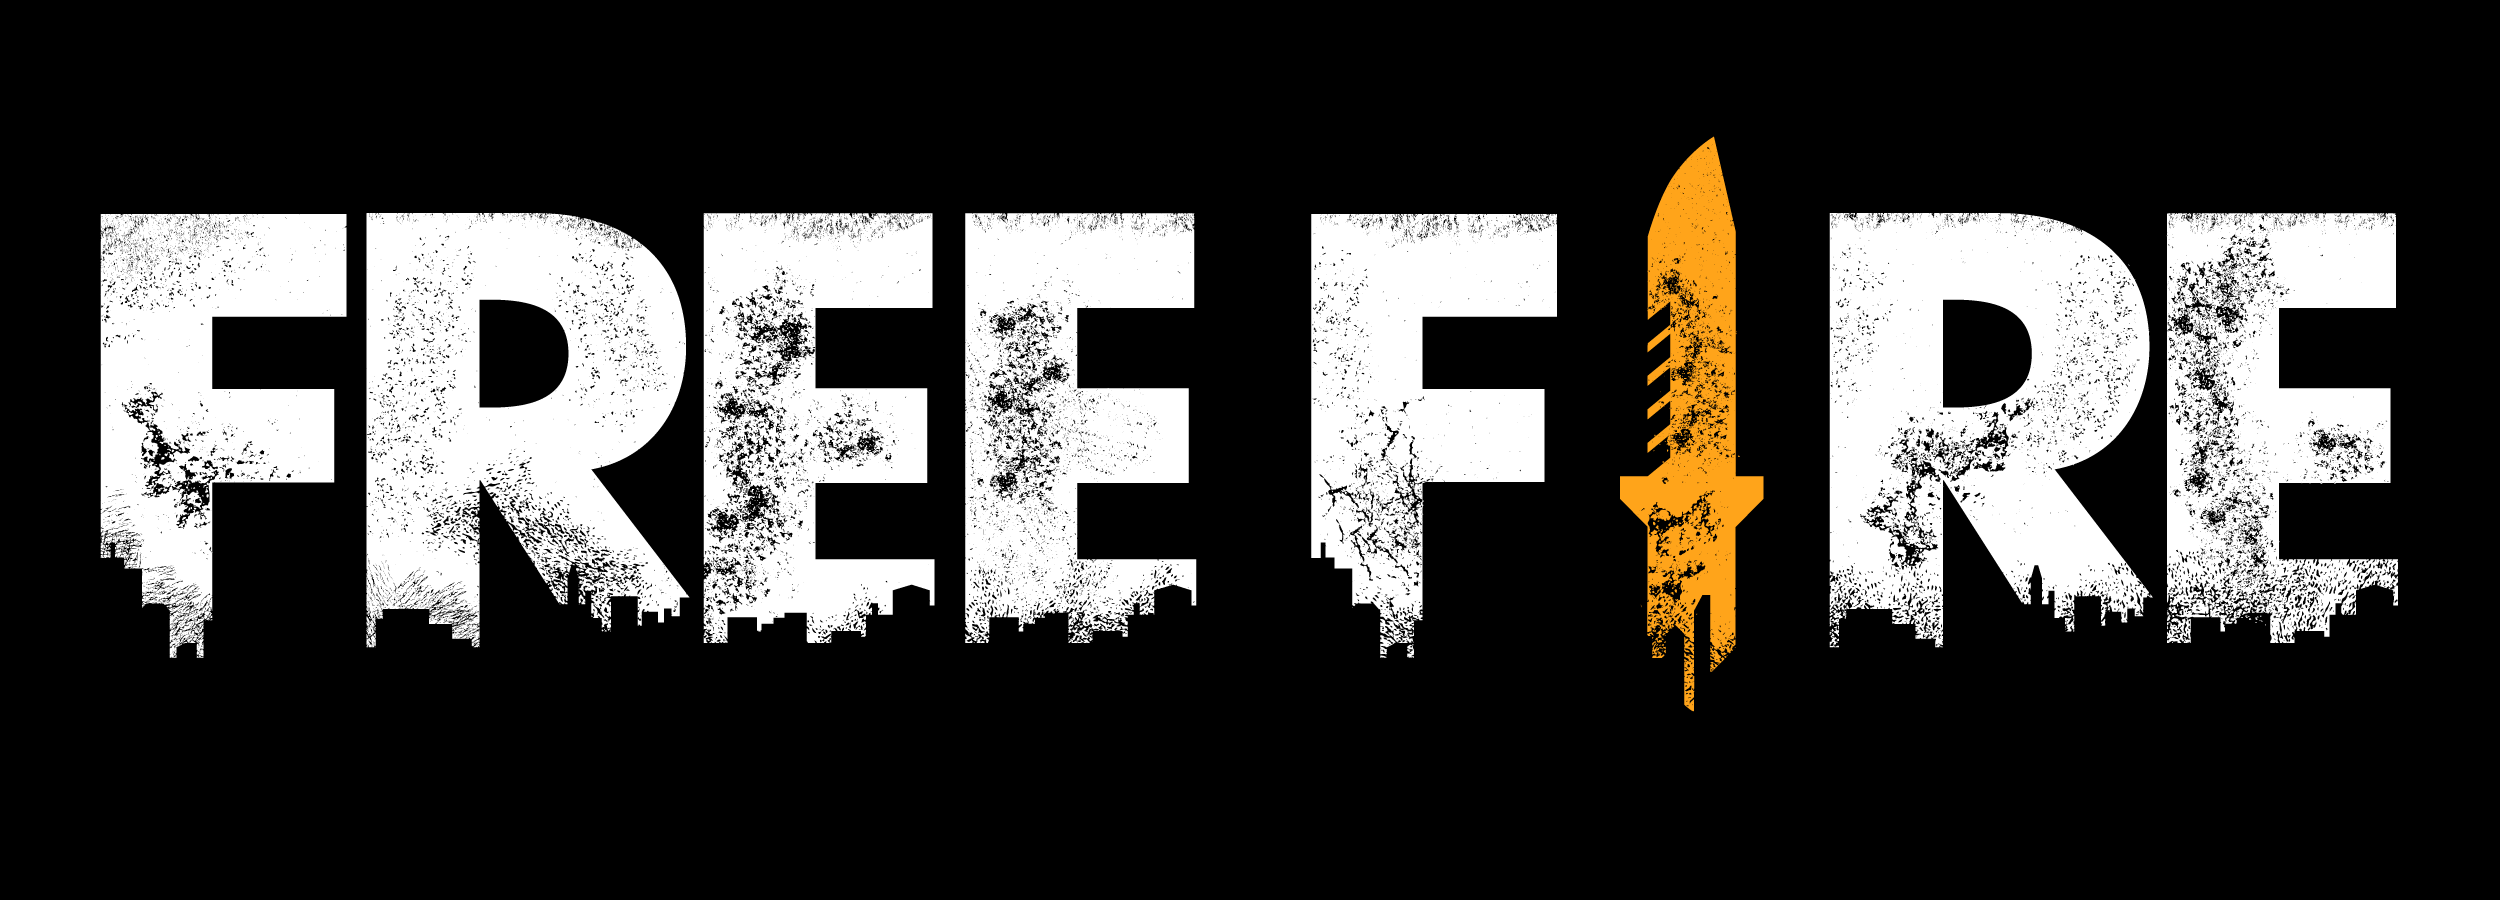 free fire logo - Free Fire Logo